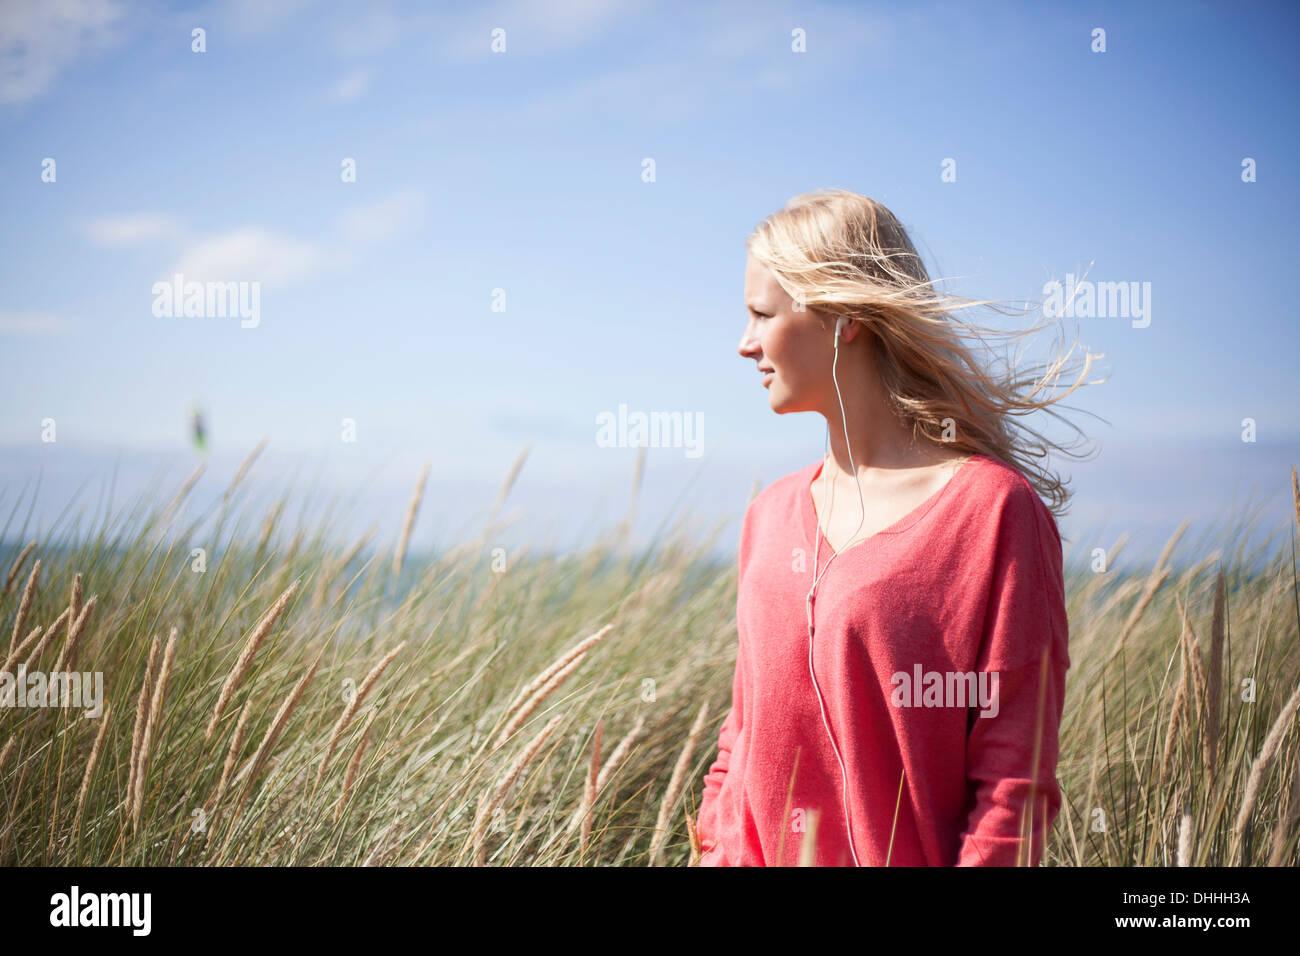 Portrait of blond woman wearing pink sweater dans l'ammophile, Pays de Galles, Royaume-Uni Photo Stock